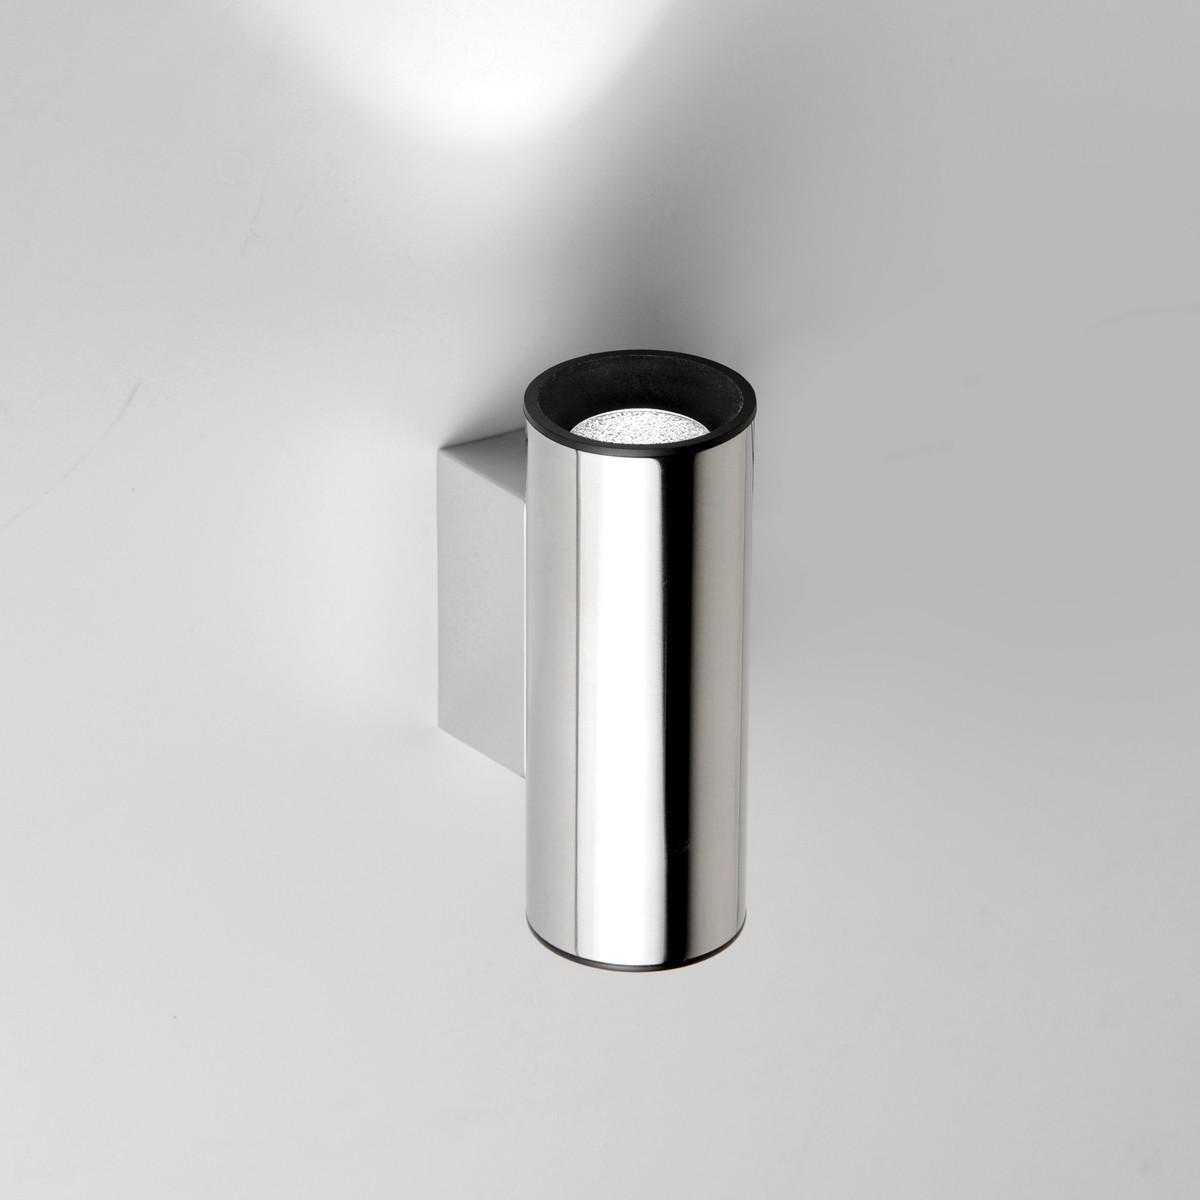 Milan Tub LED Wandleuchte, 1-flg., Edelstahl poliert / schwarz